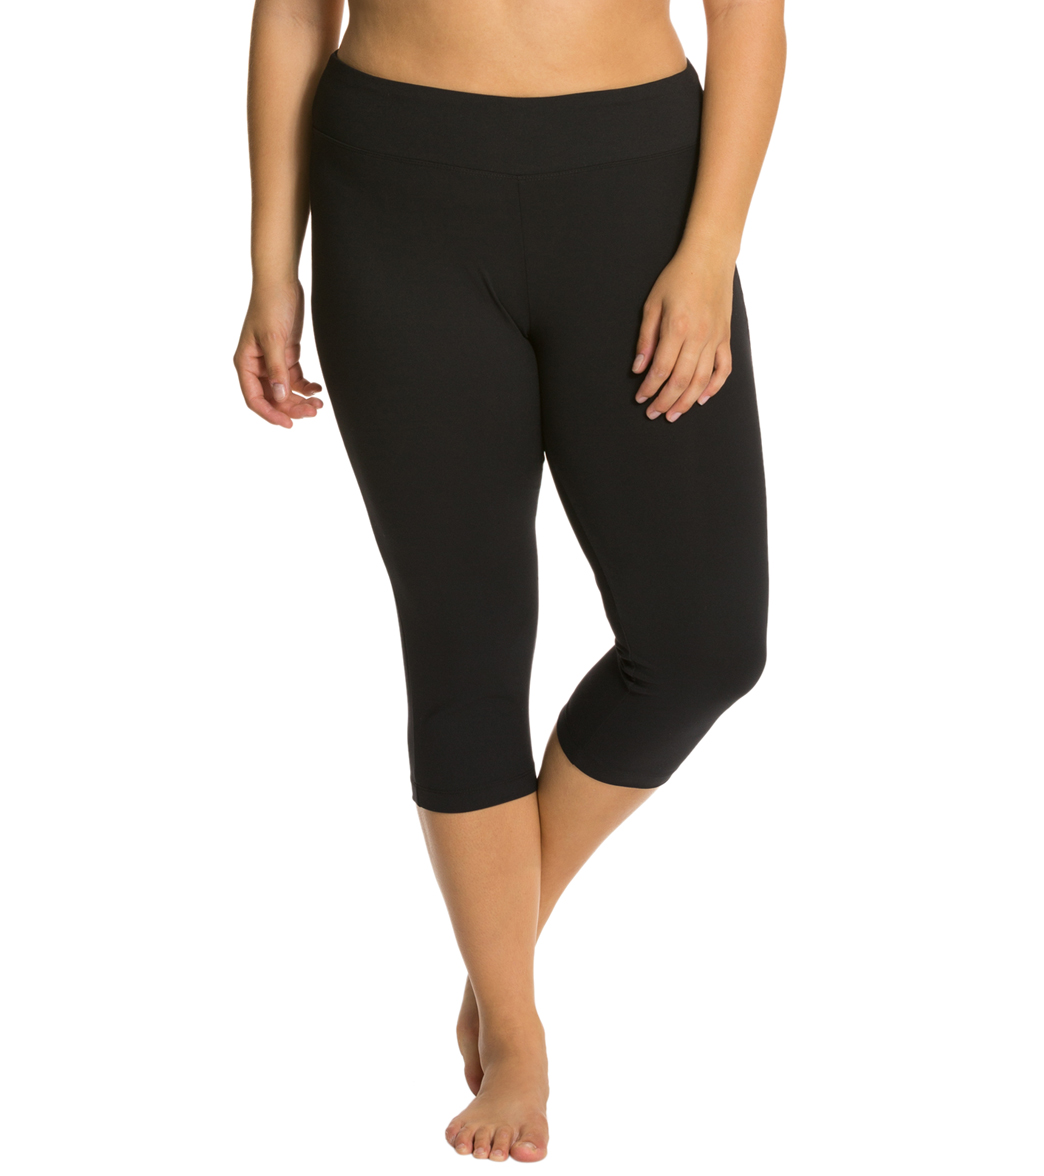 1a1d2120a2e8ca Marika Plus Size Flat Waisted Yoga Capris at YogaOutlet.com